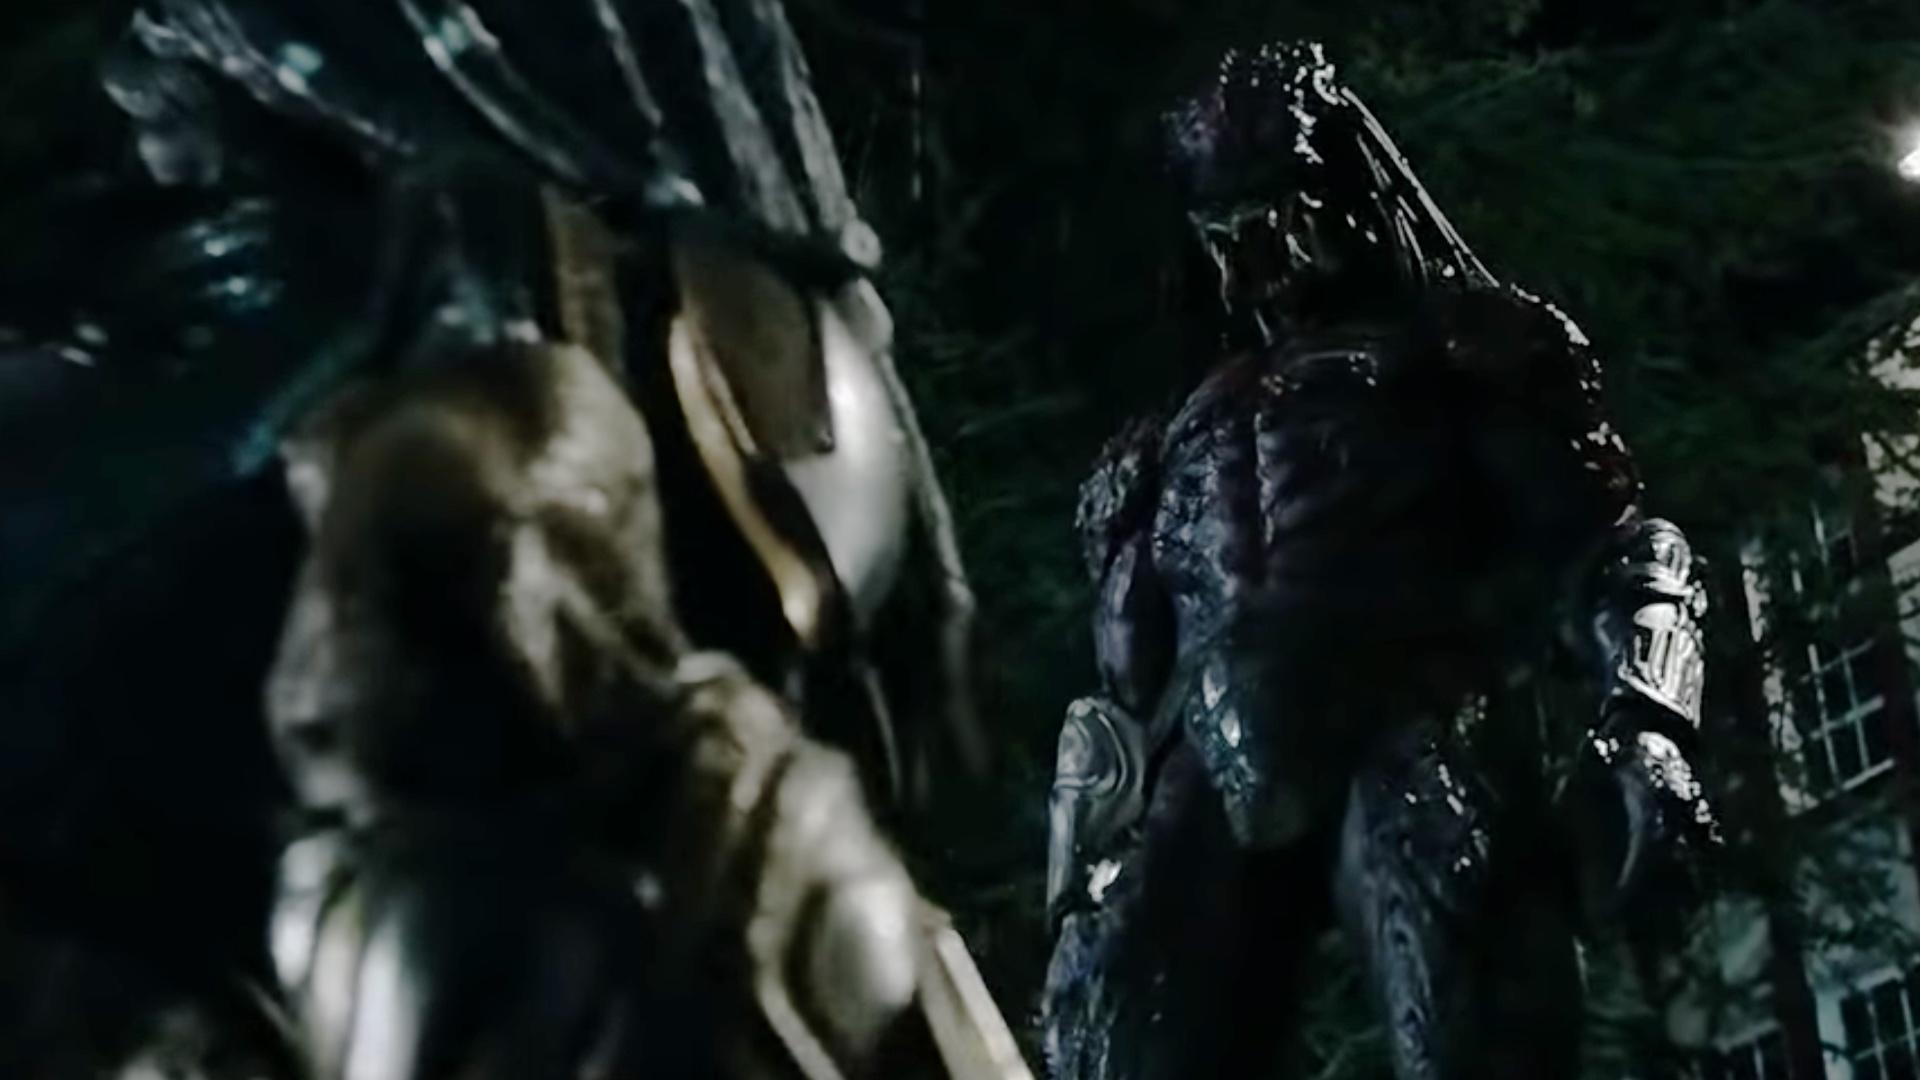 new-action-packed-trailer-for-the-predator-reveals-a-second-predator-social.jpg